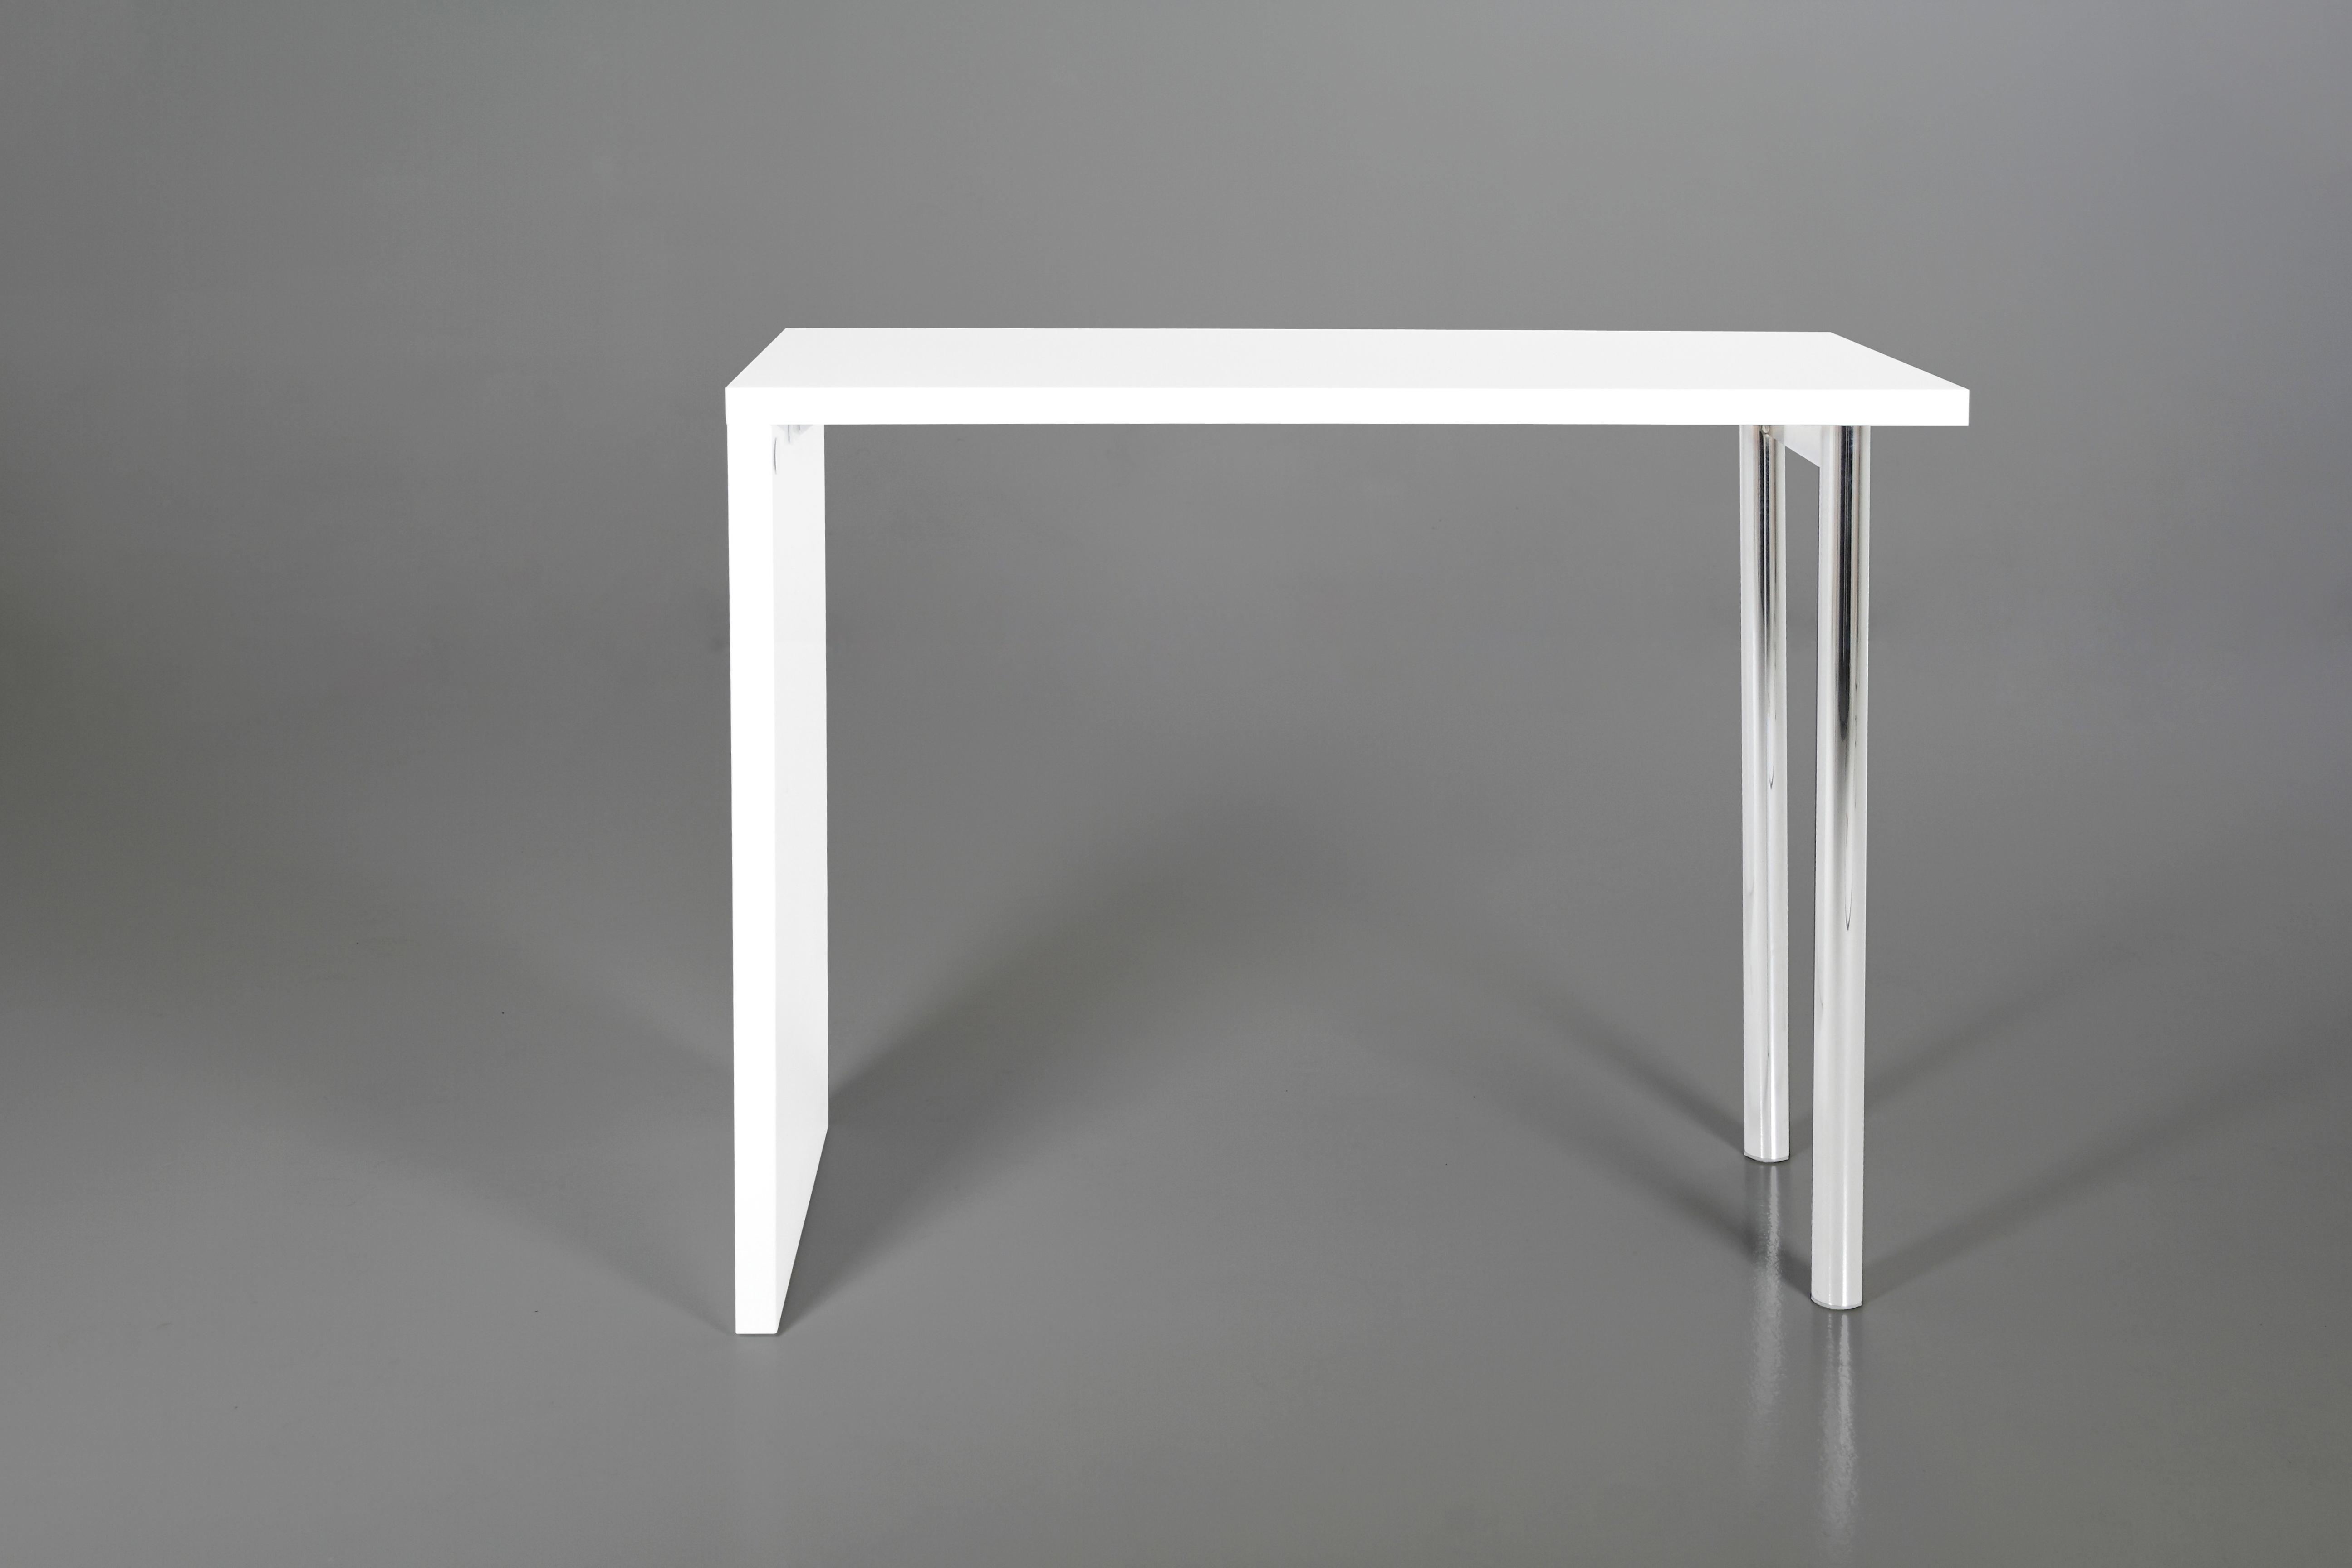 Masa de bar Budgie White, L120xl60xh105 cm